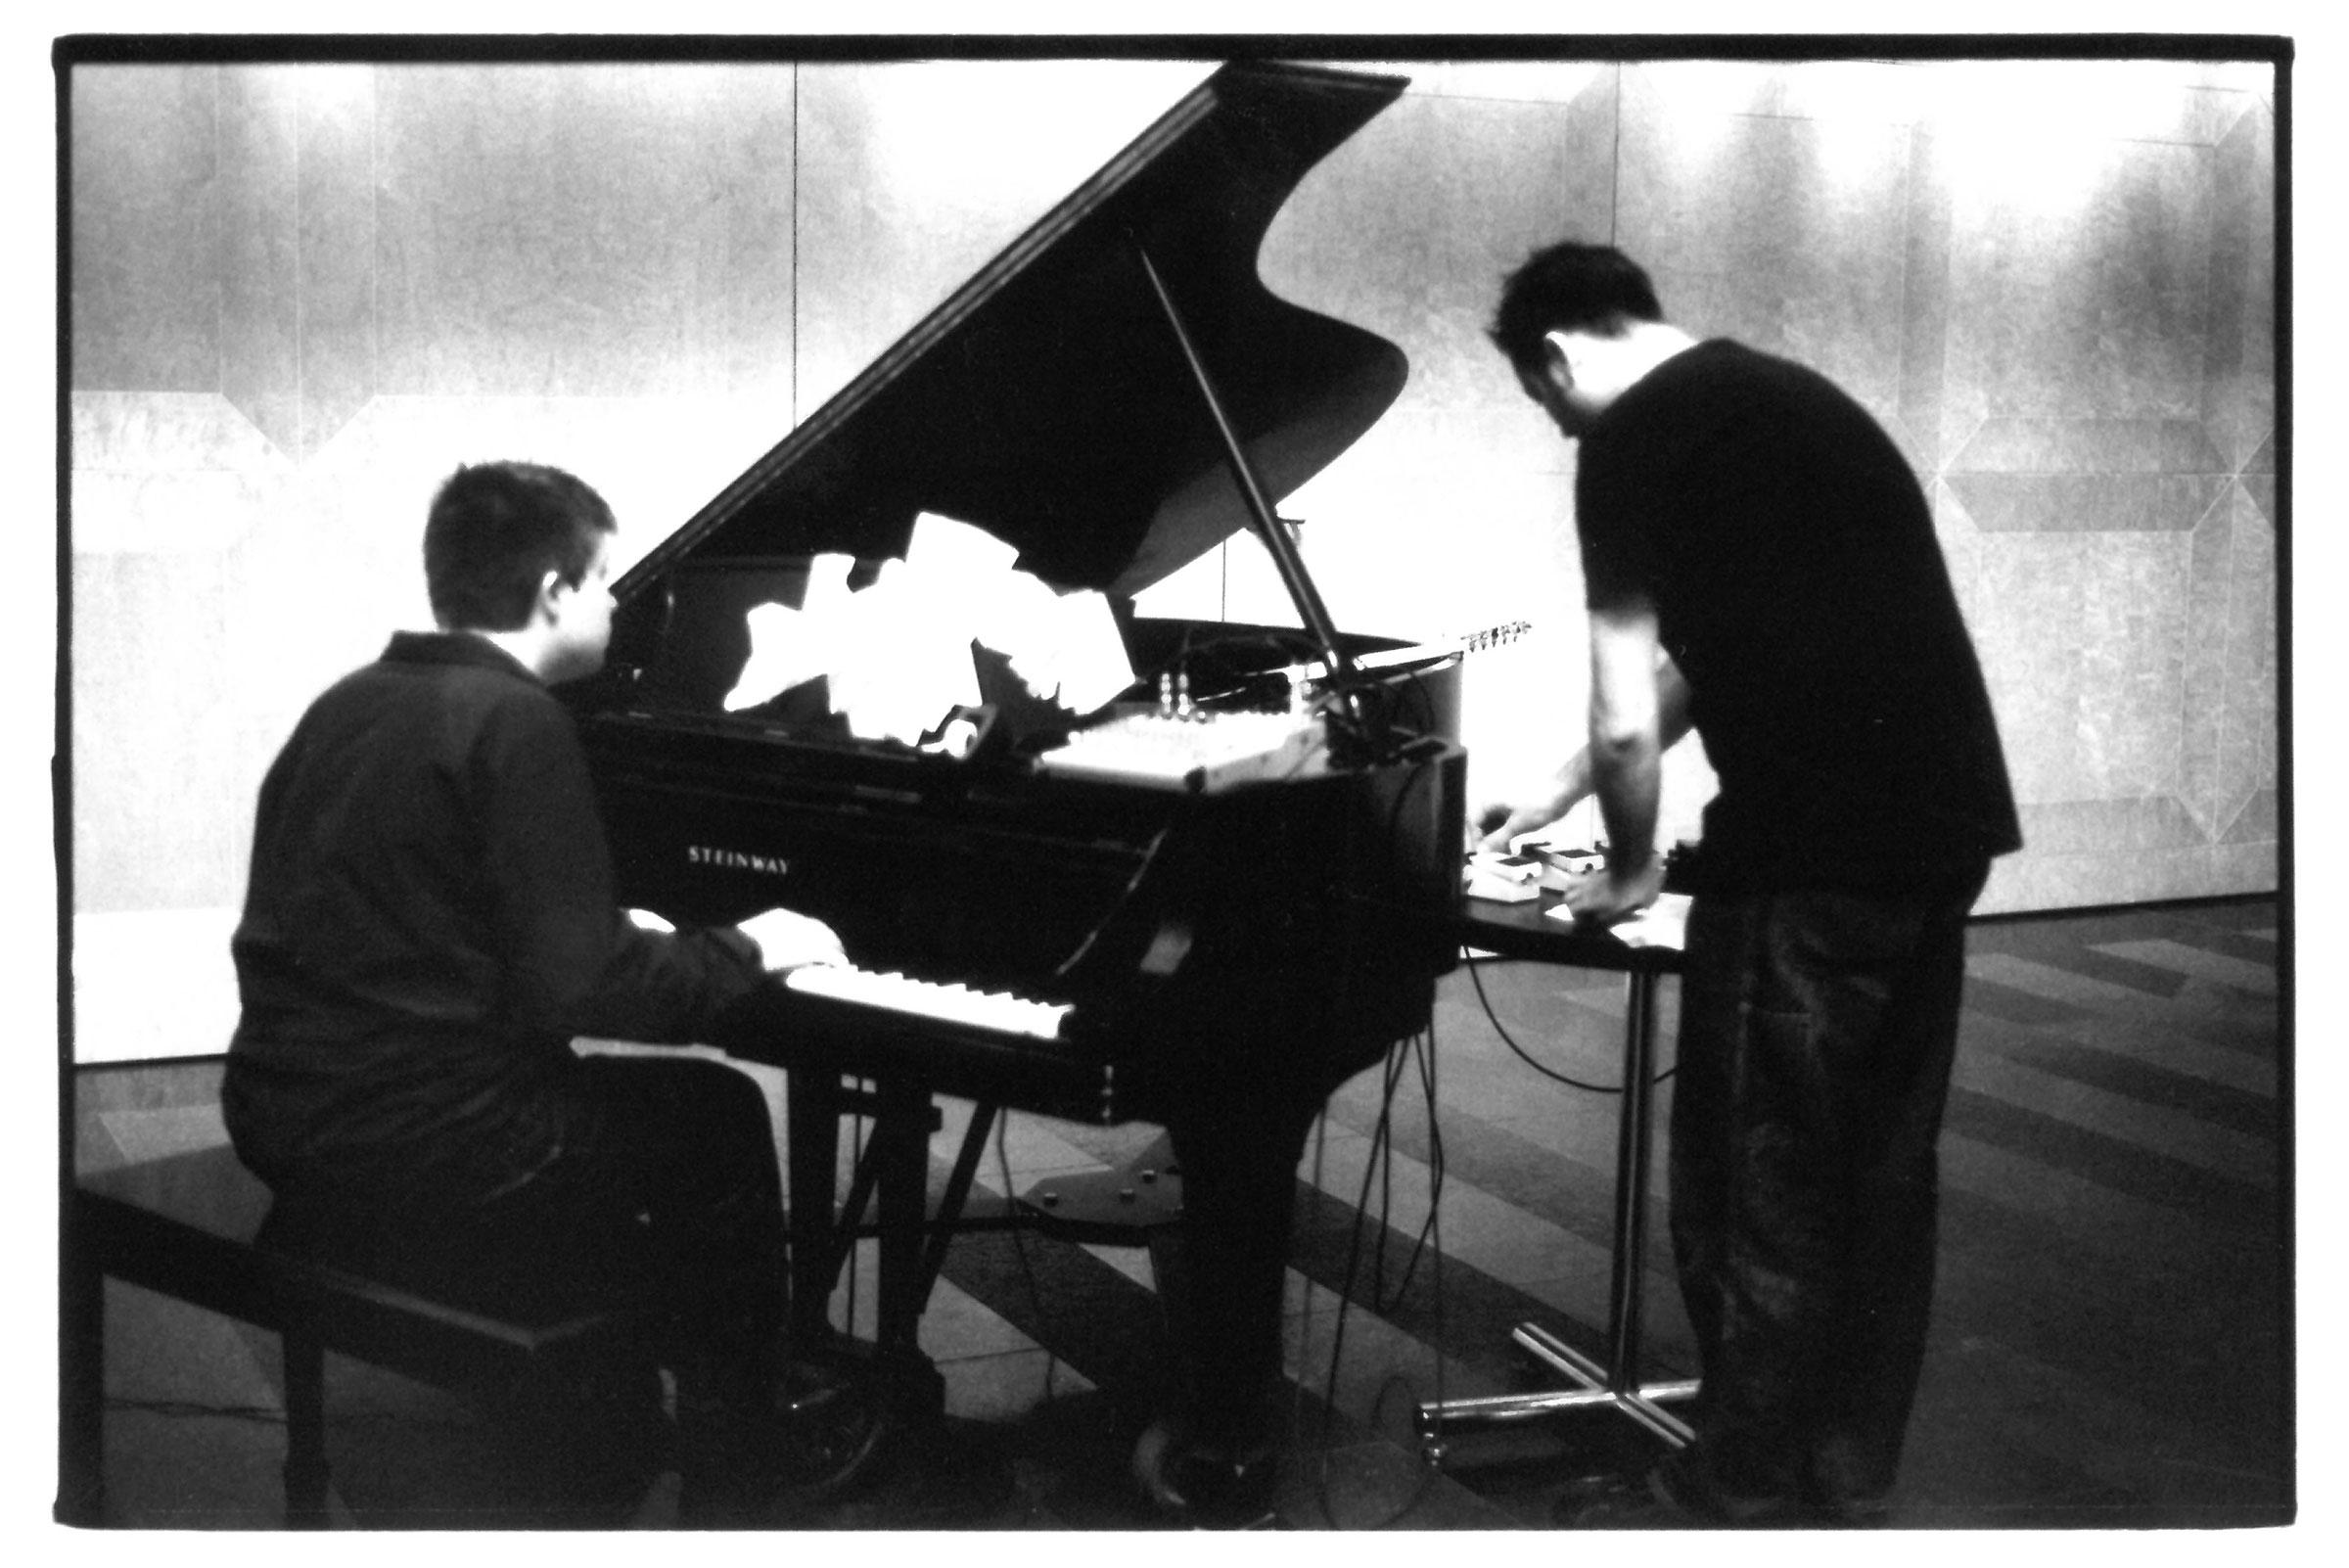 Randy Nordschow and Roddy Schrock